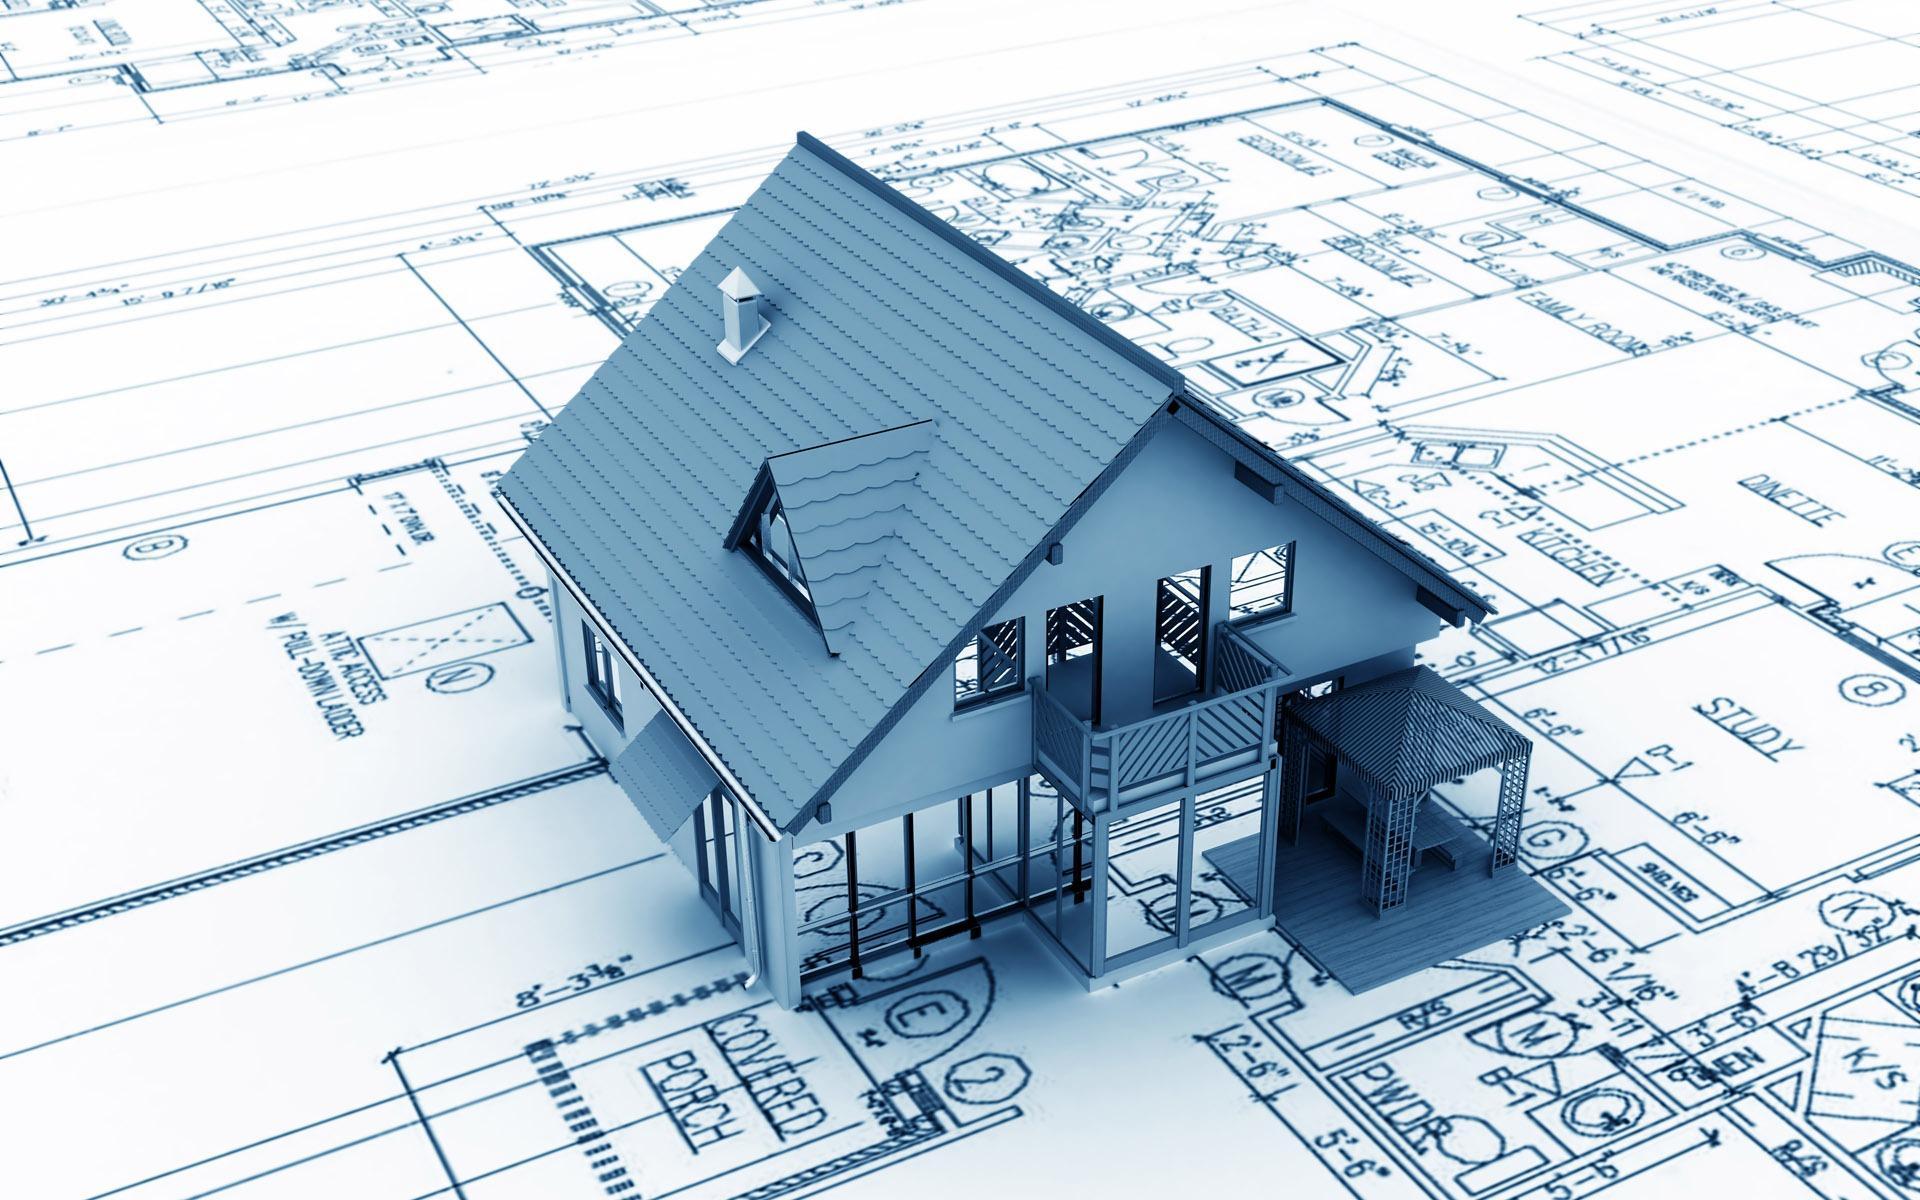 3d animation architectural model makers veetil digital google malvernweather Choice Image